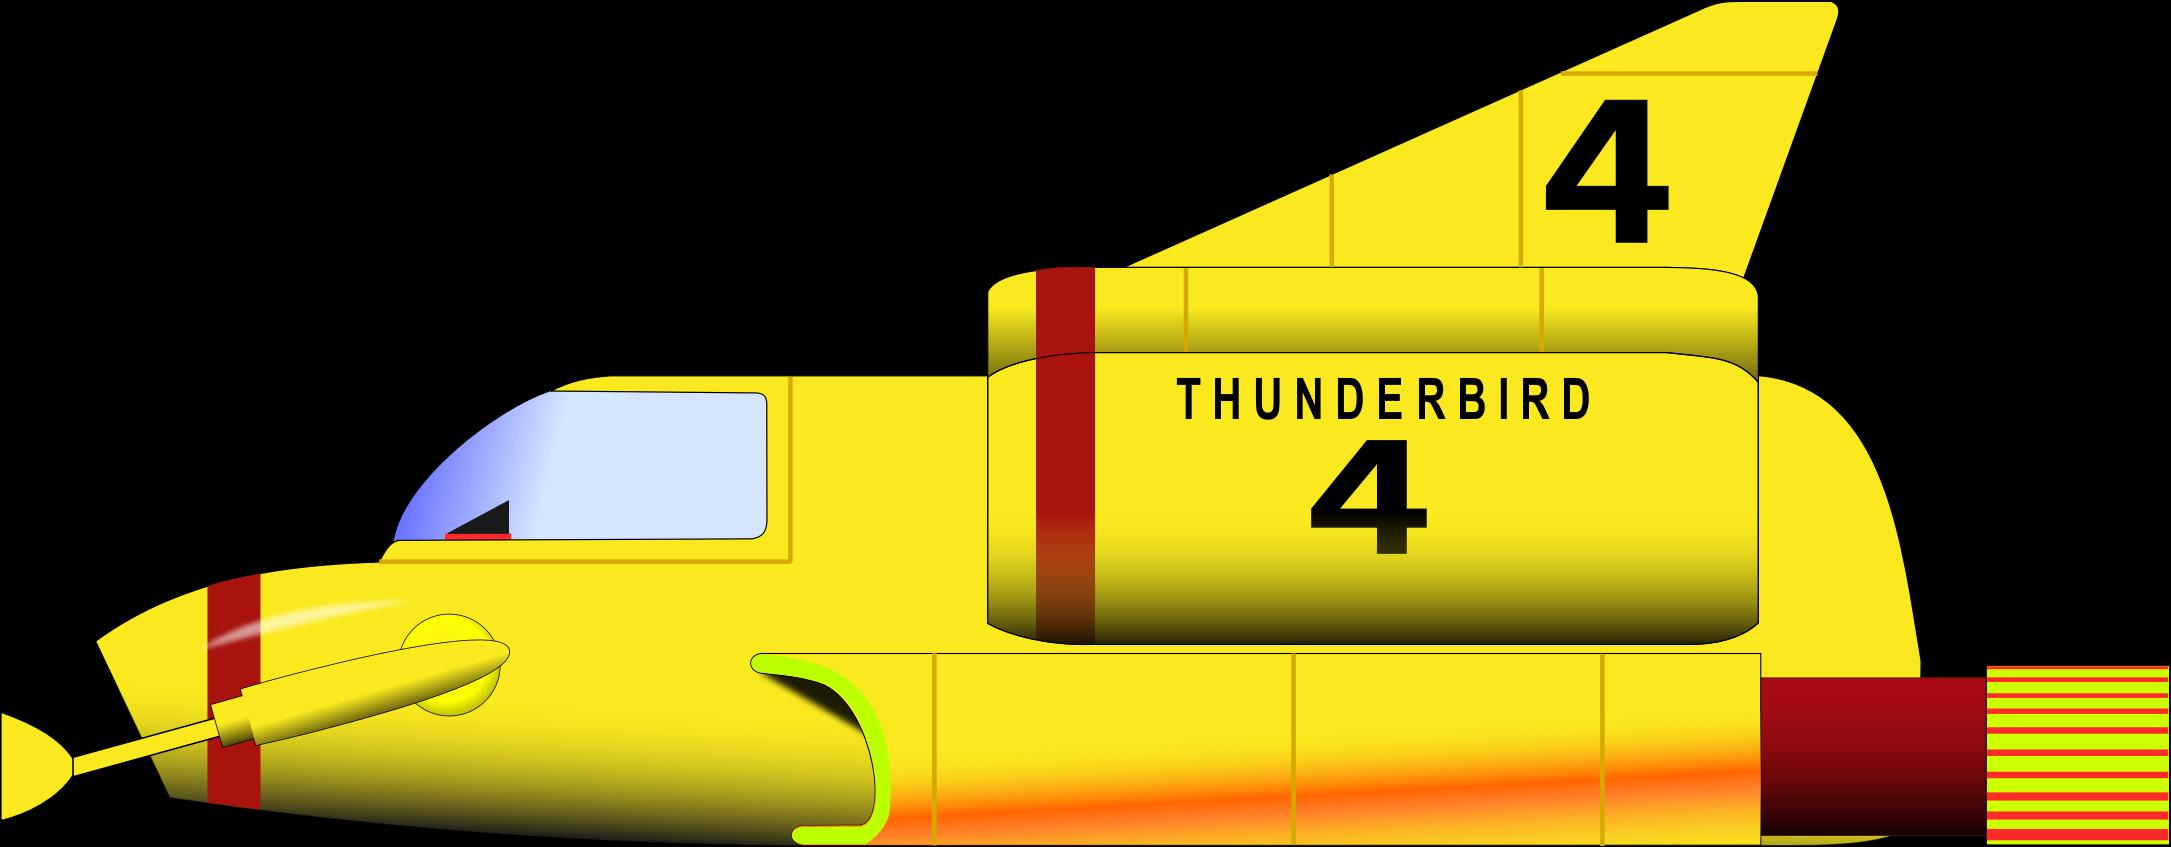 Thunderbird Free